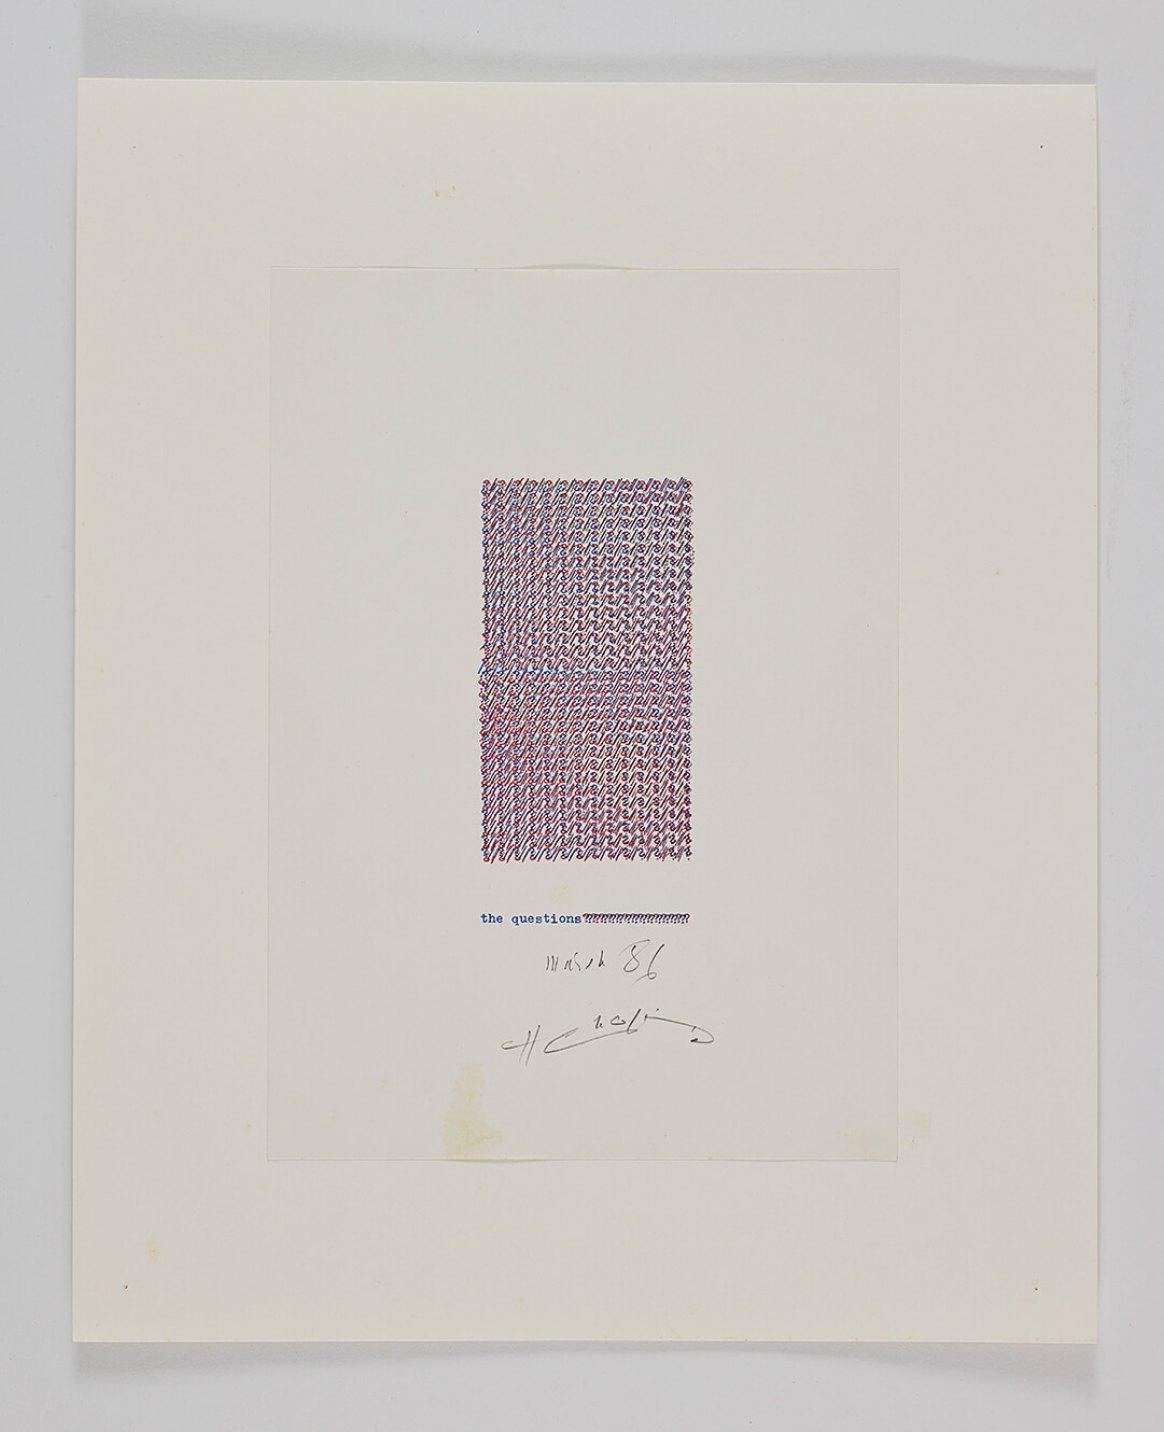 Henri Chopin,<em>The questions?</em>,1986,ink on paper (typewritten poems),42 × 34 cm - Mendes Wood DM